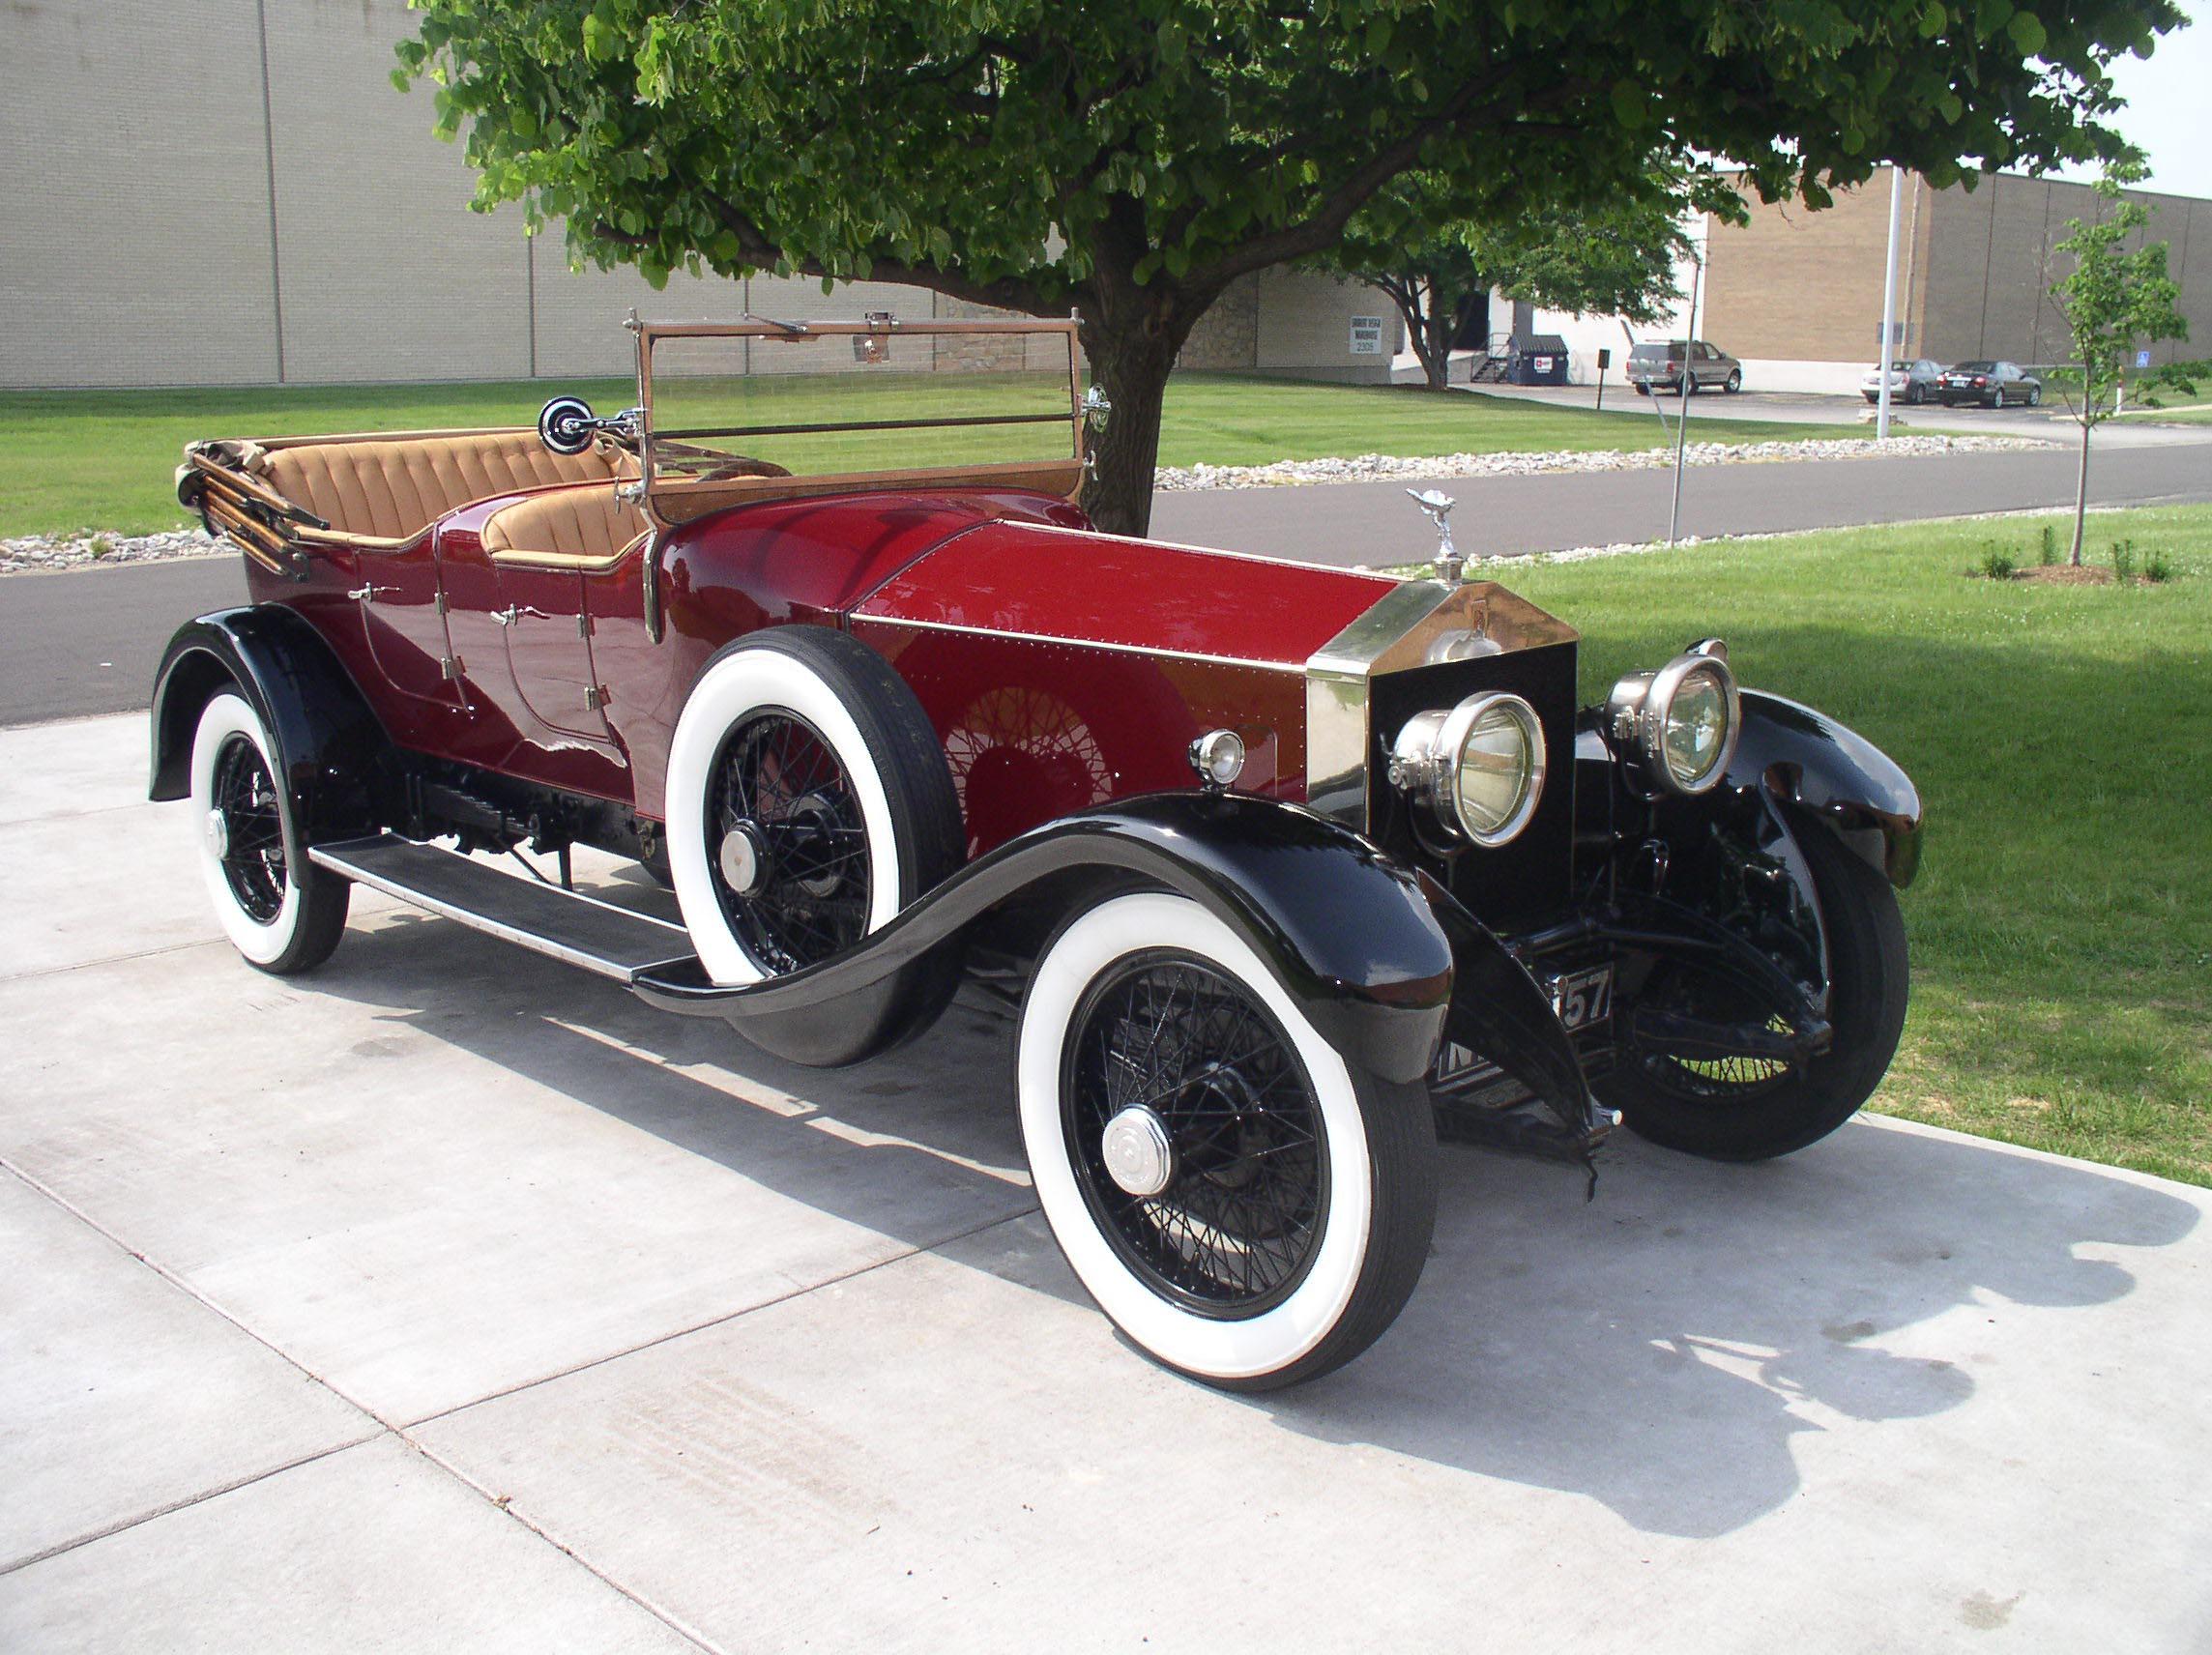 This Week in Automotive History: Dec. 17-Dec. 23 thumbnail